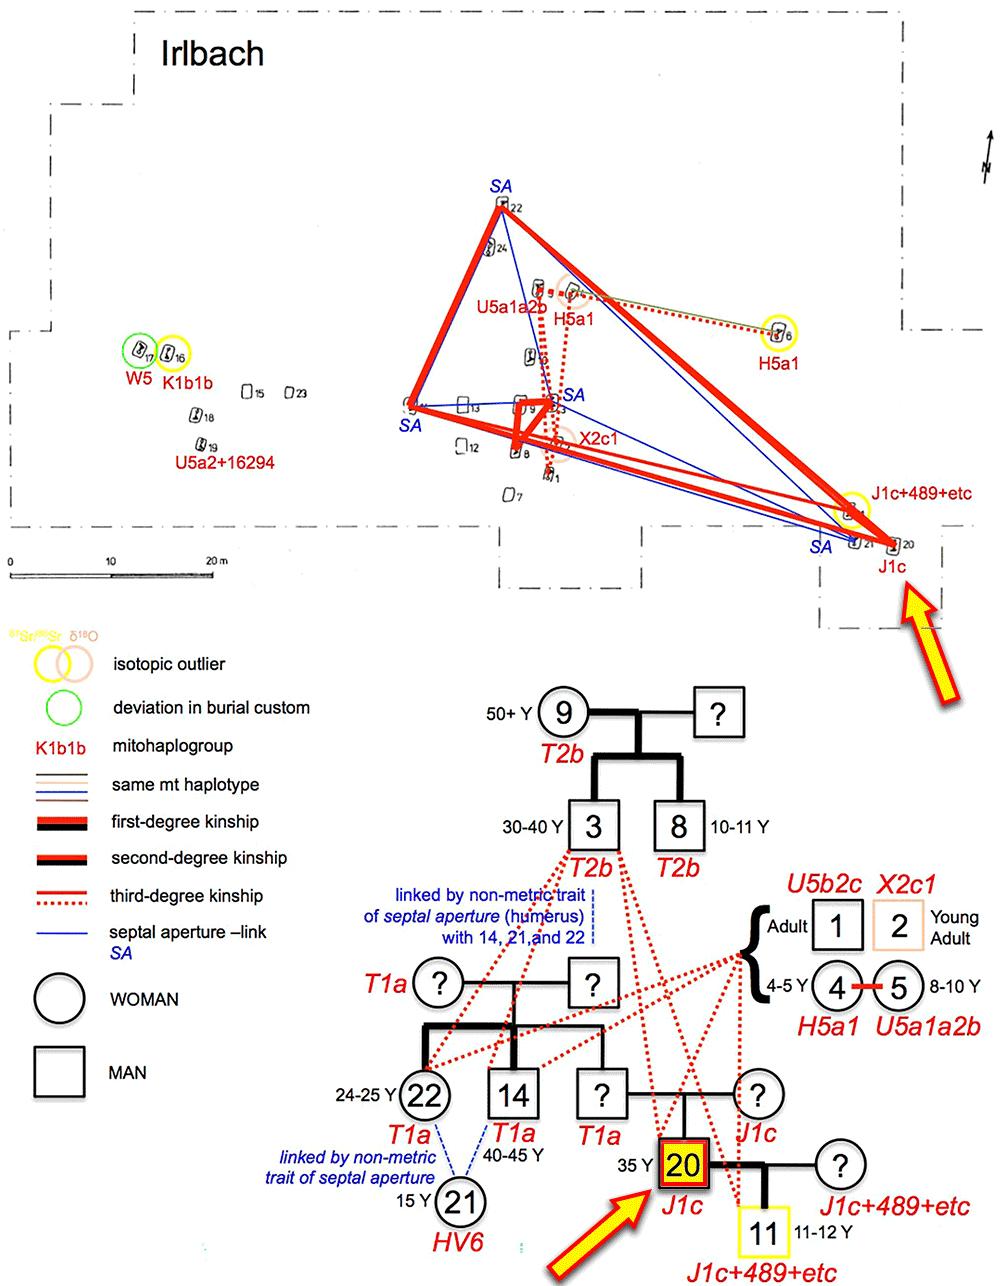 irlbach-cemetery-mtdna